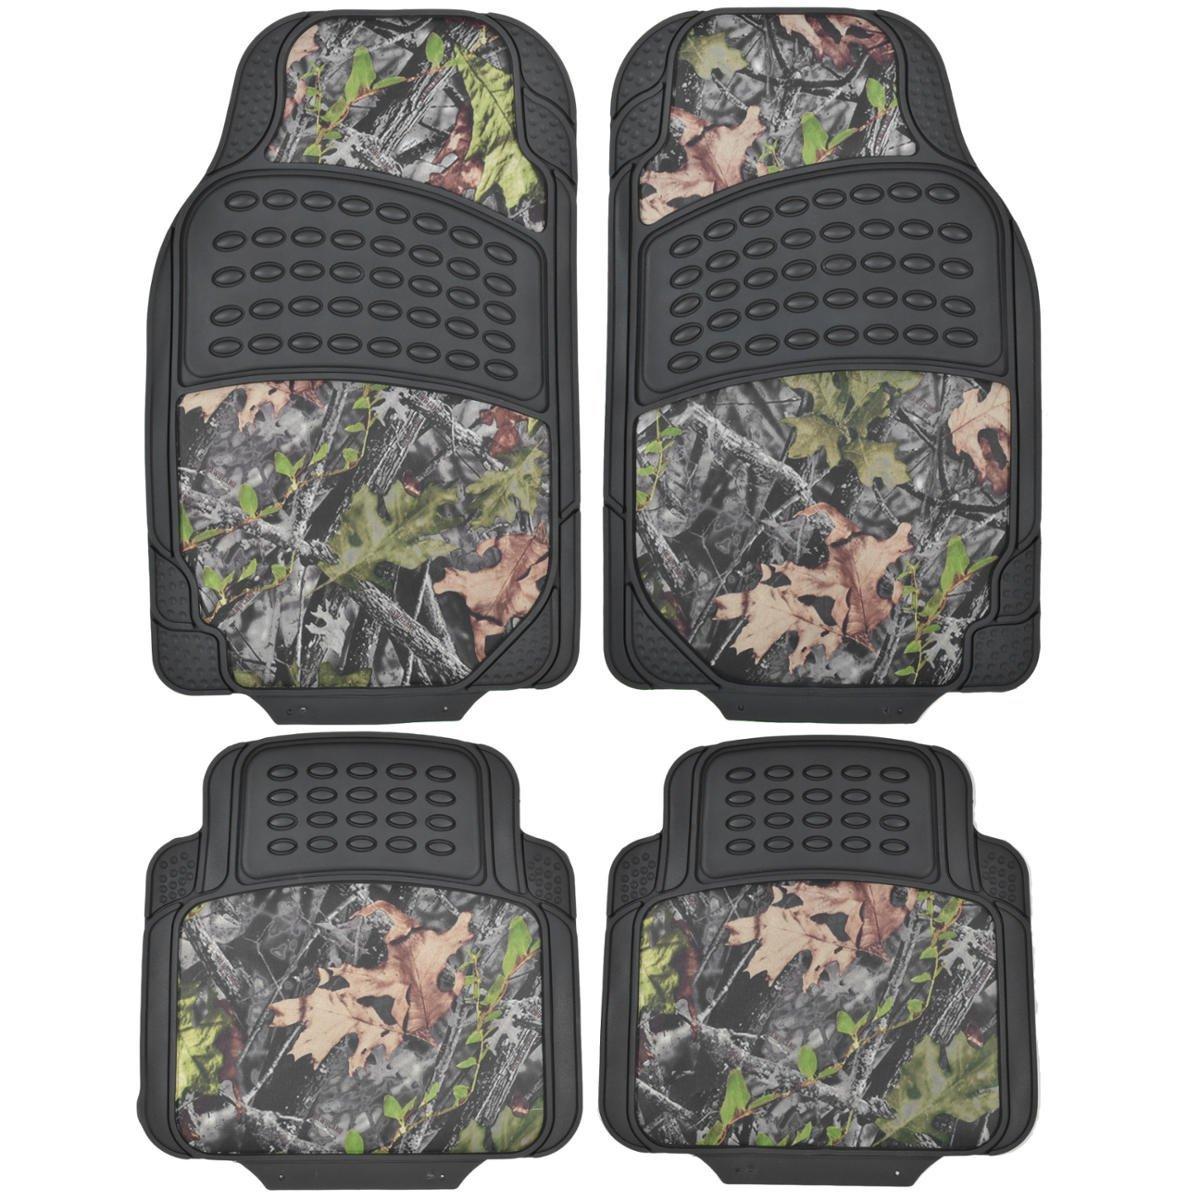 Floor mats b q - Bdk Camouflage 4 Piece All Weather Waterproof Rubber Car Floor Mats Fit Most Car Truck